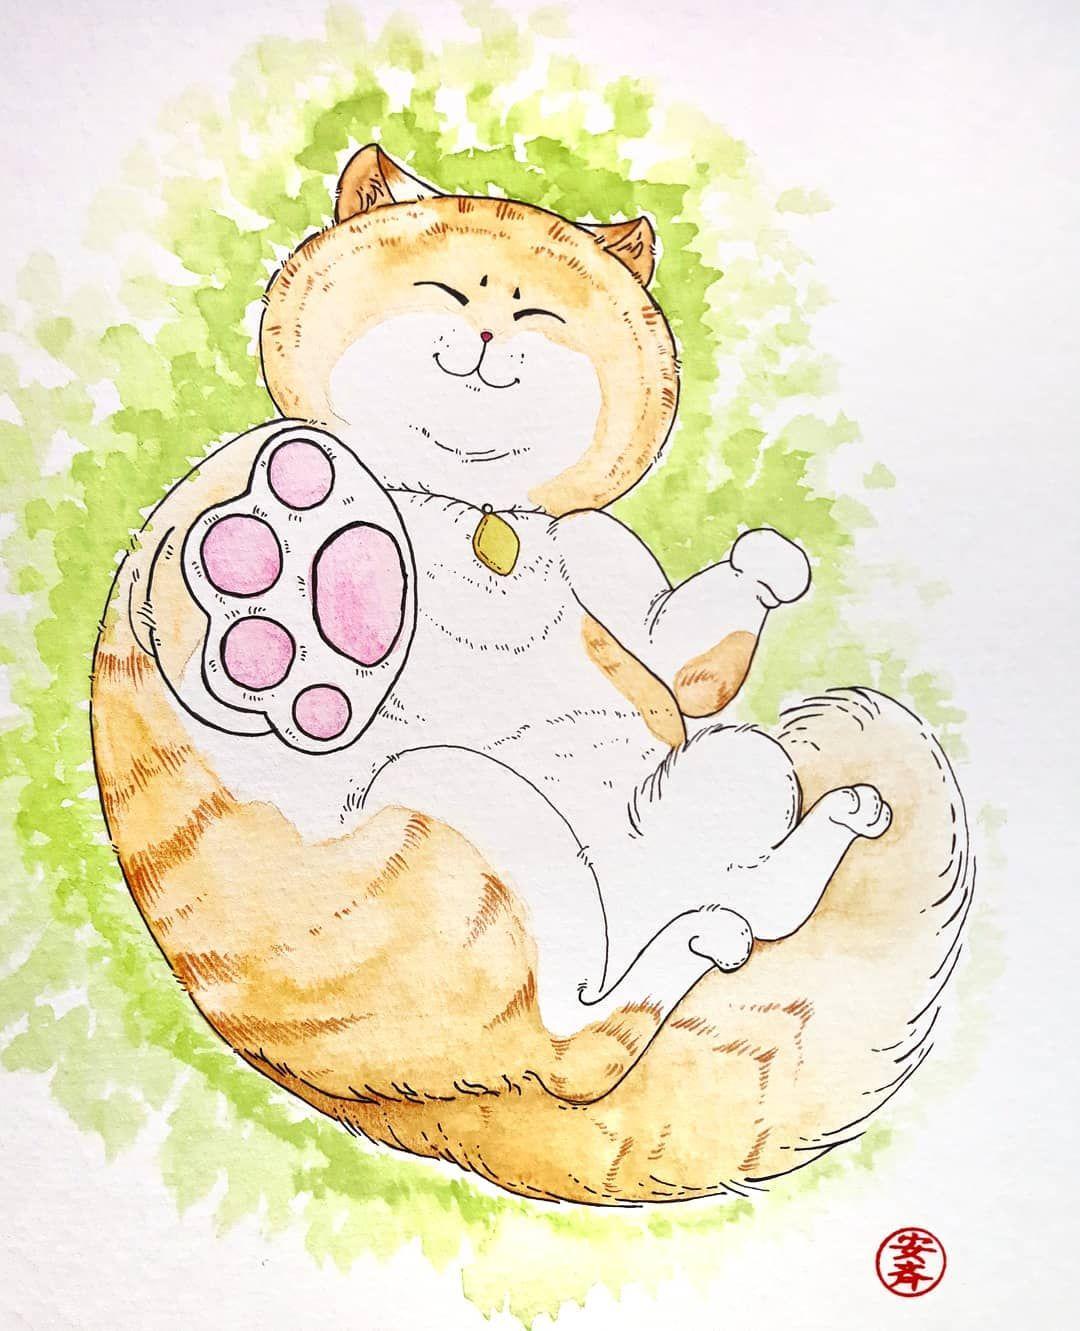 Watercolor Illustration Of A Kitten Desenhos E Ilustracoes